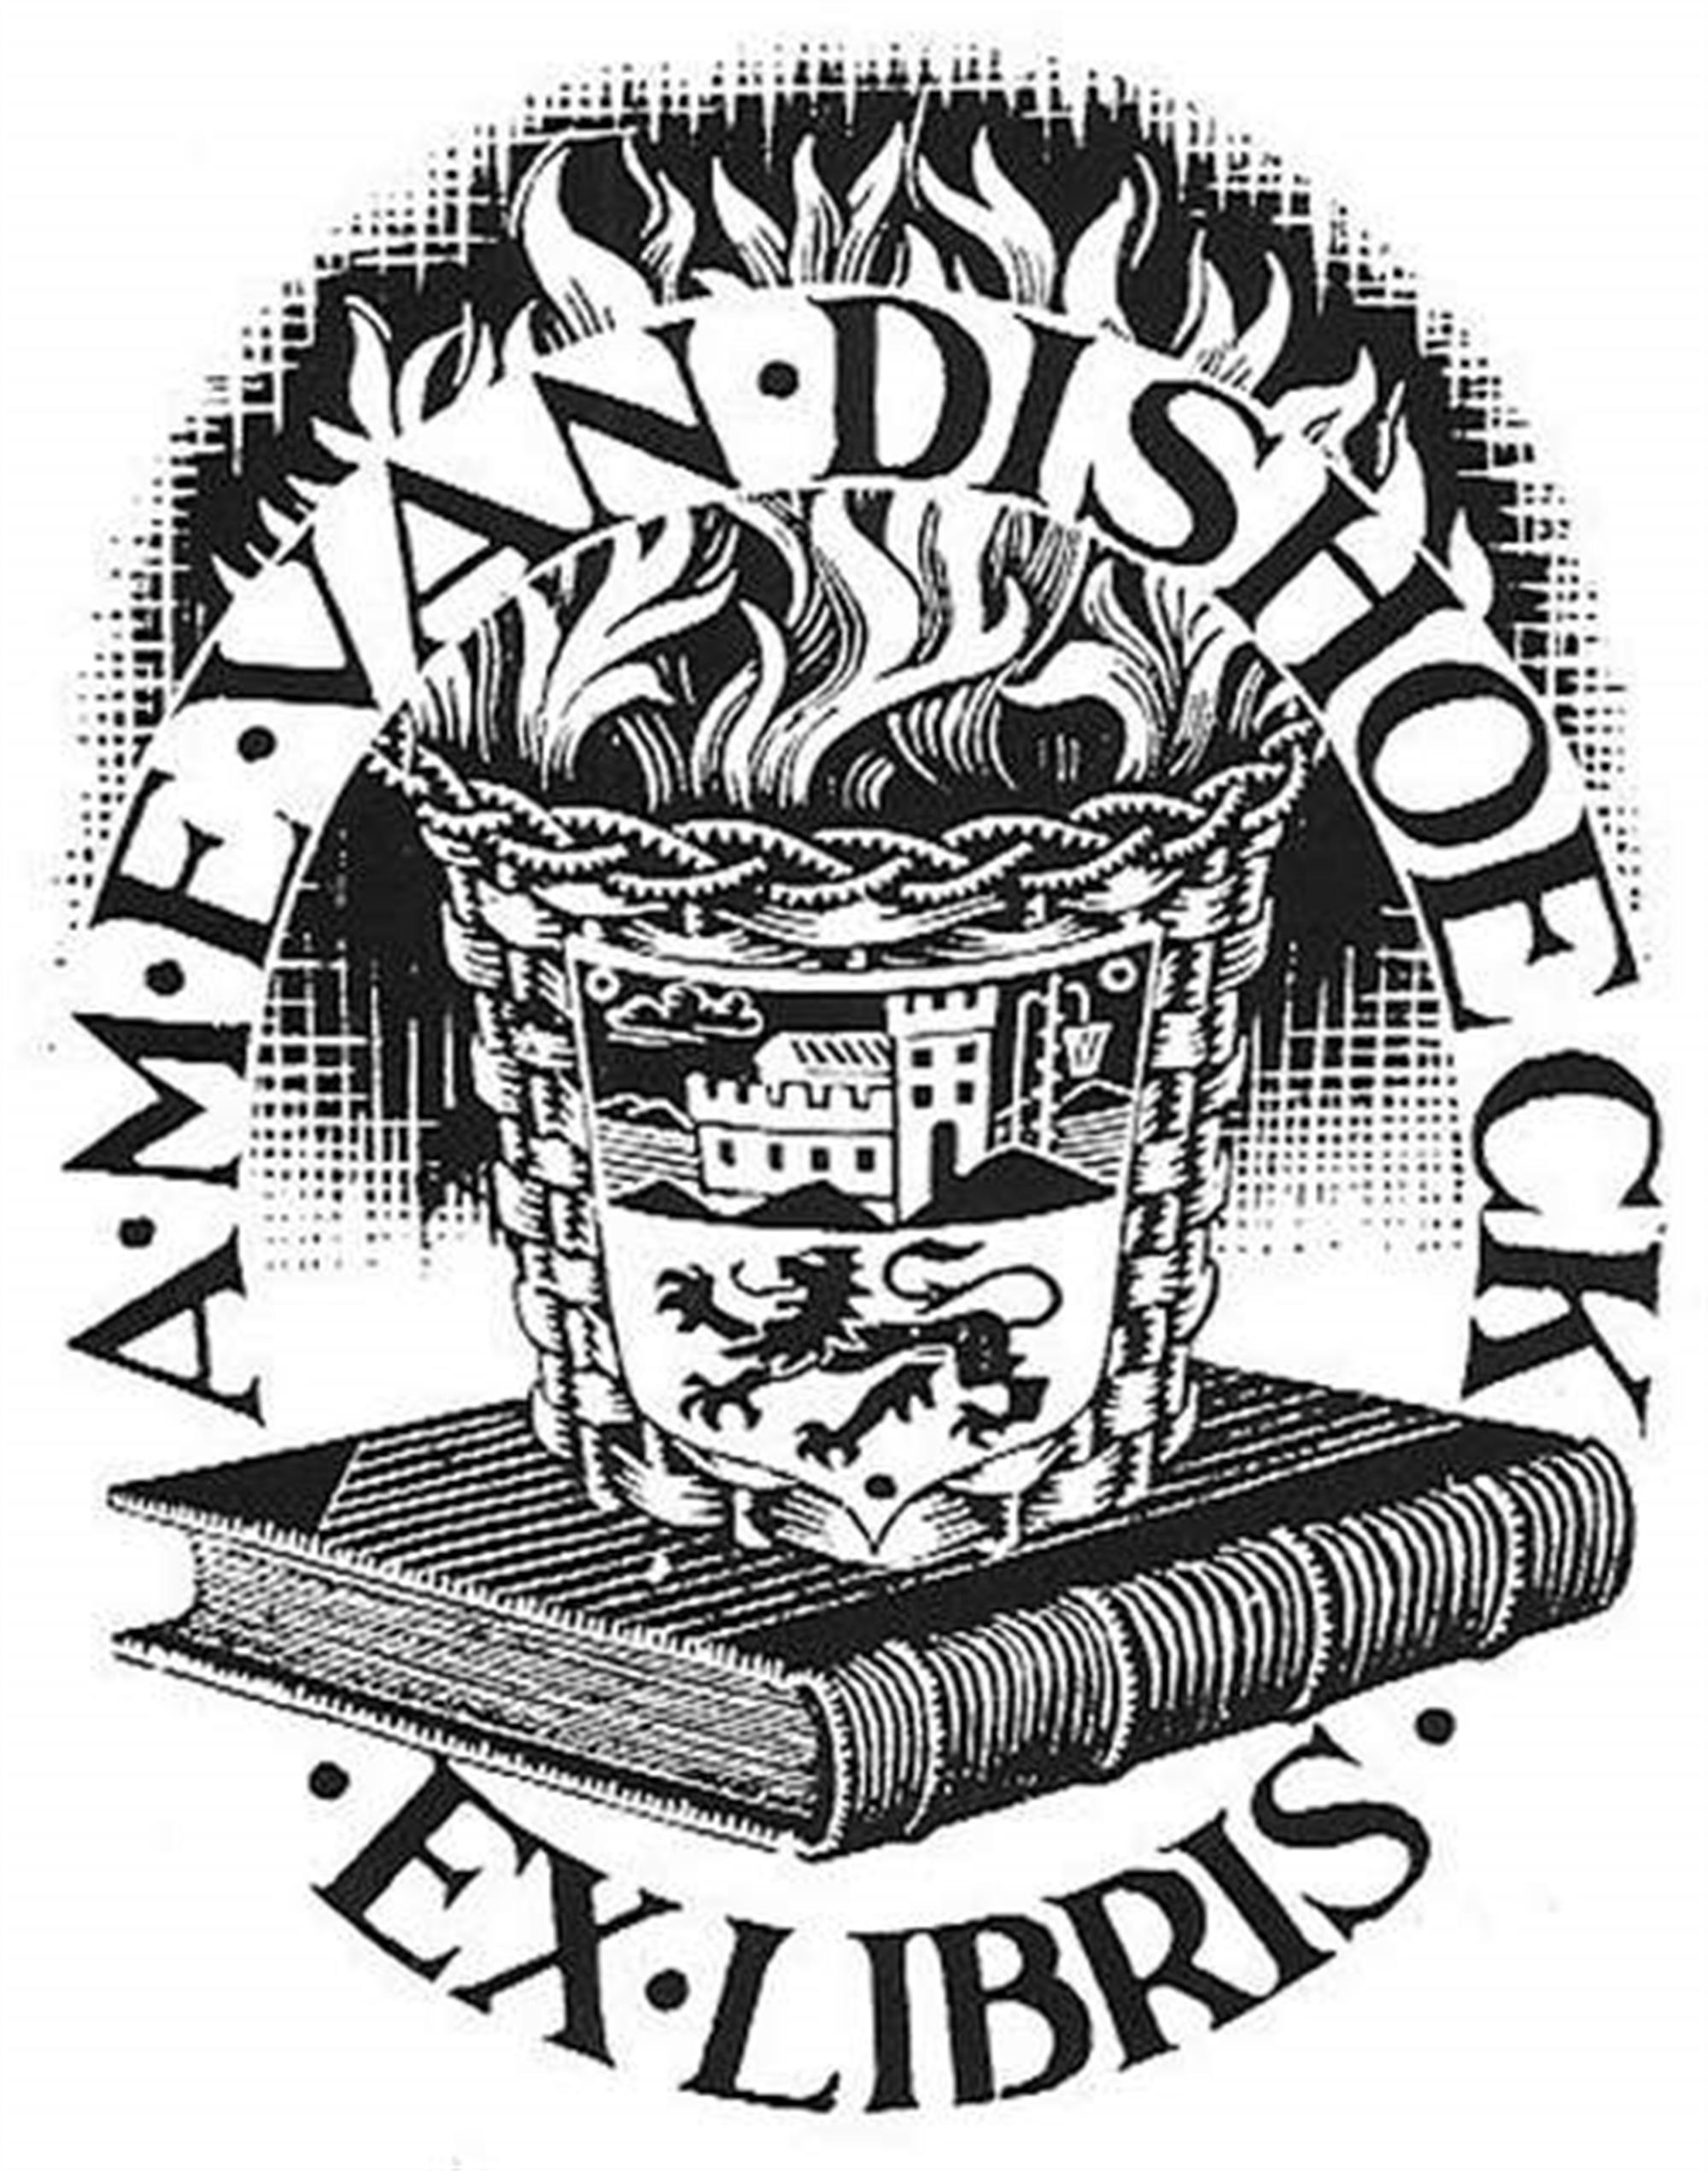 Ex Libris (Bookplate) by M.C. Escher